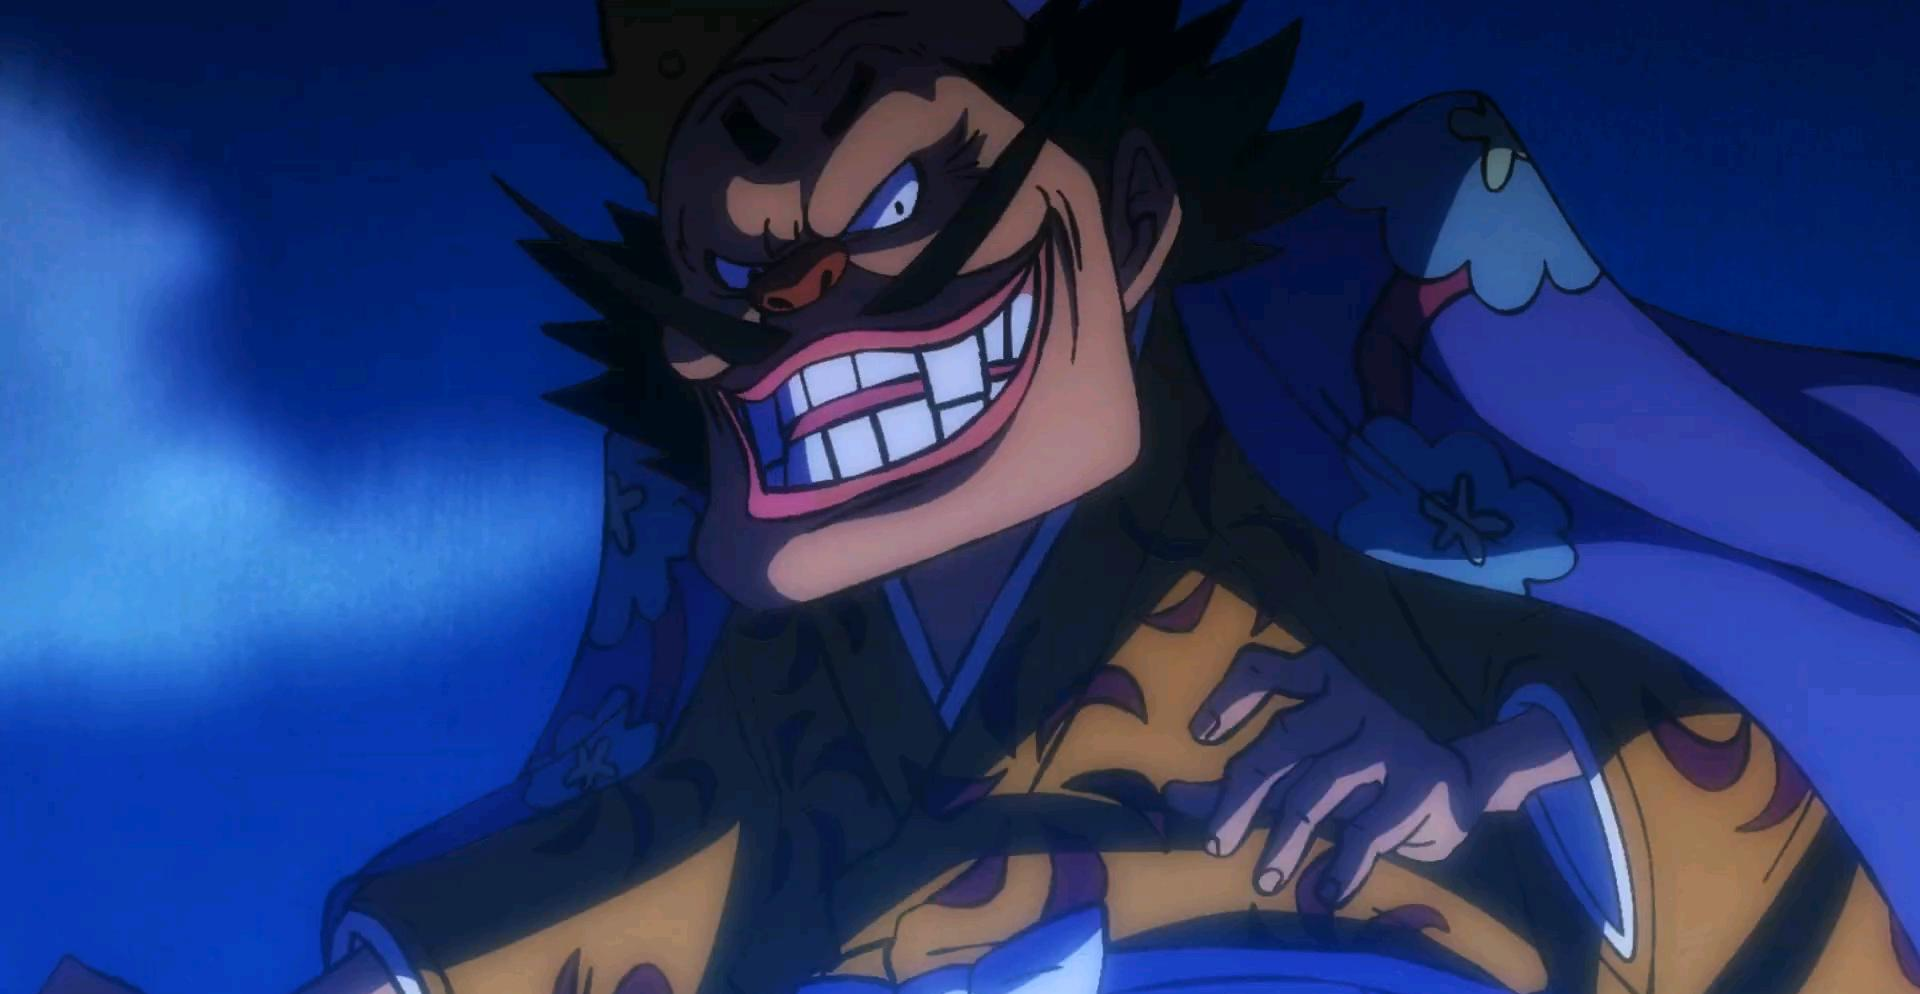 Kurozumi Orochi One Piece